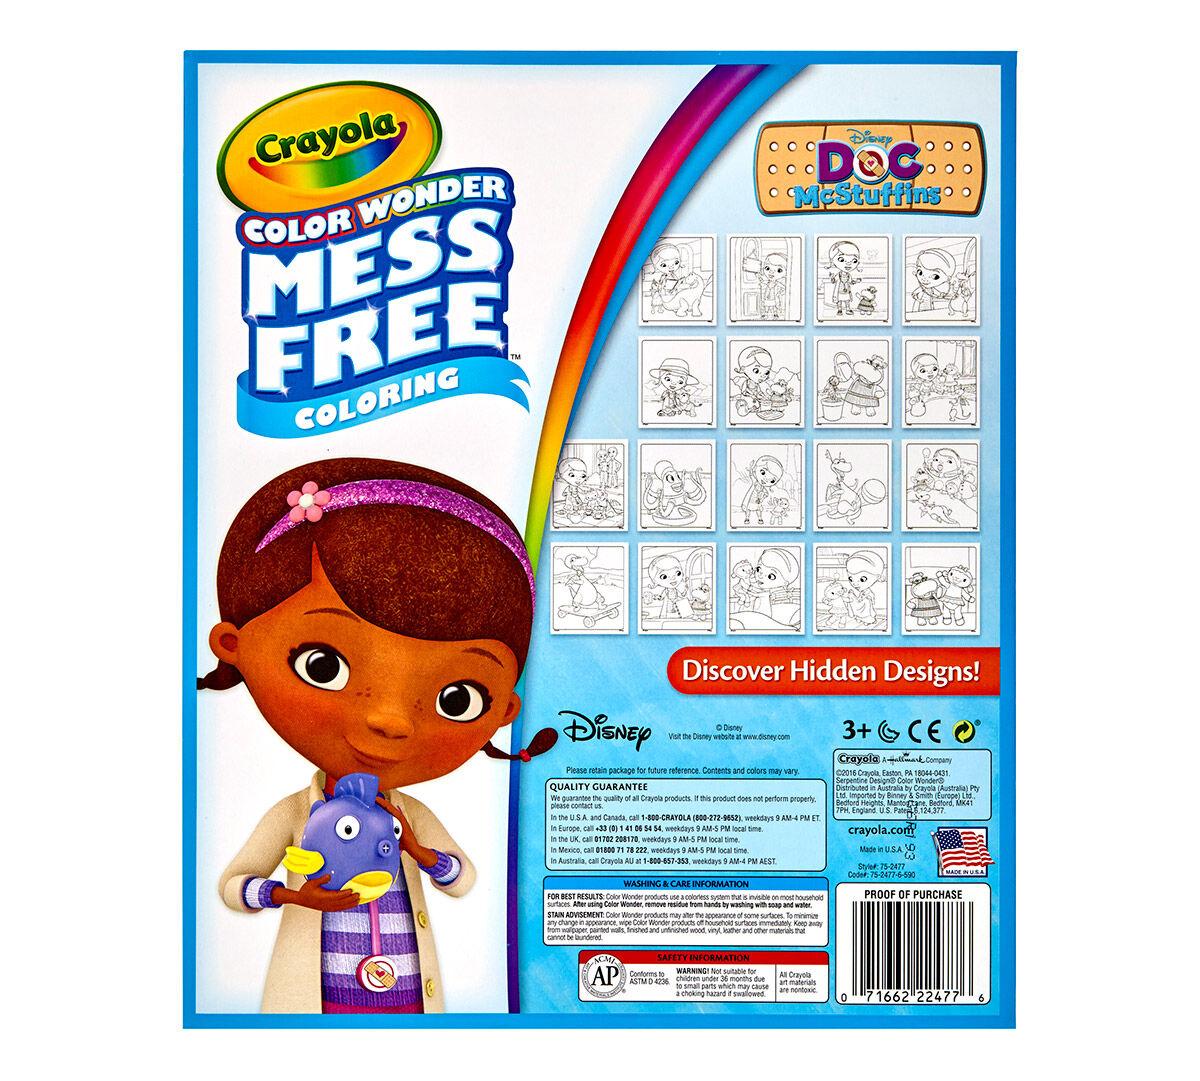 Color Wonder Mess Free Coloring Pad, Doc McStuffins - Crayola